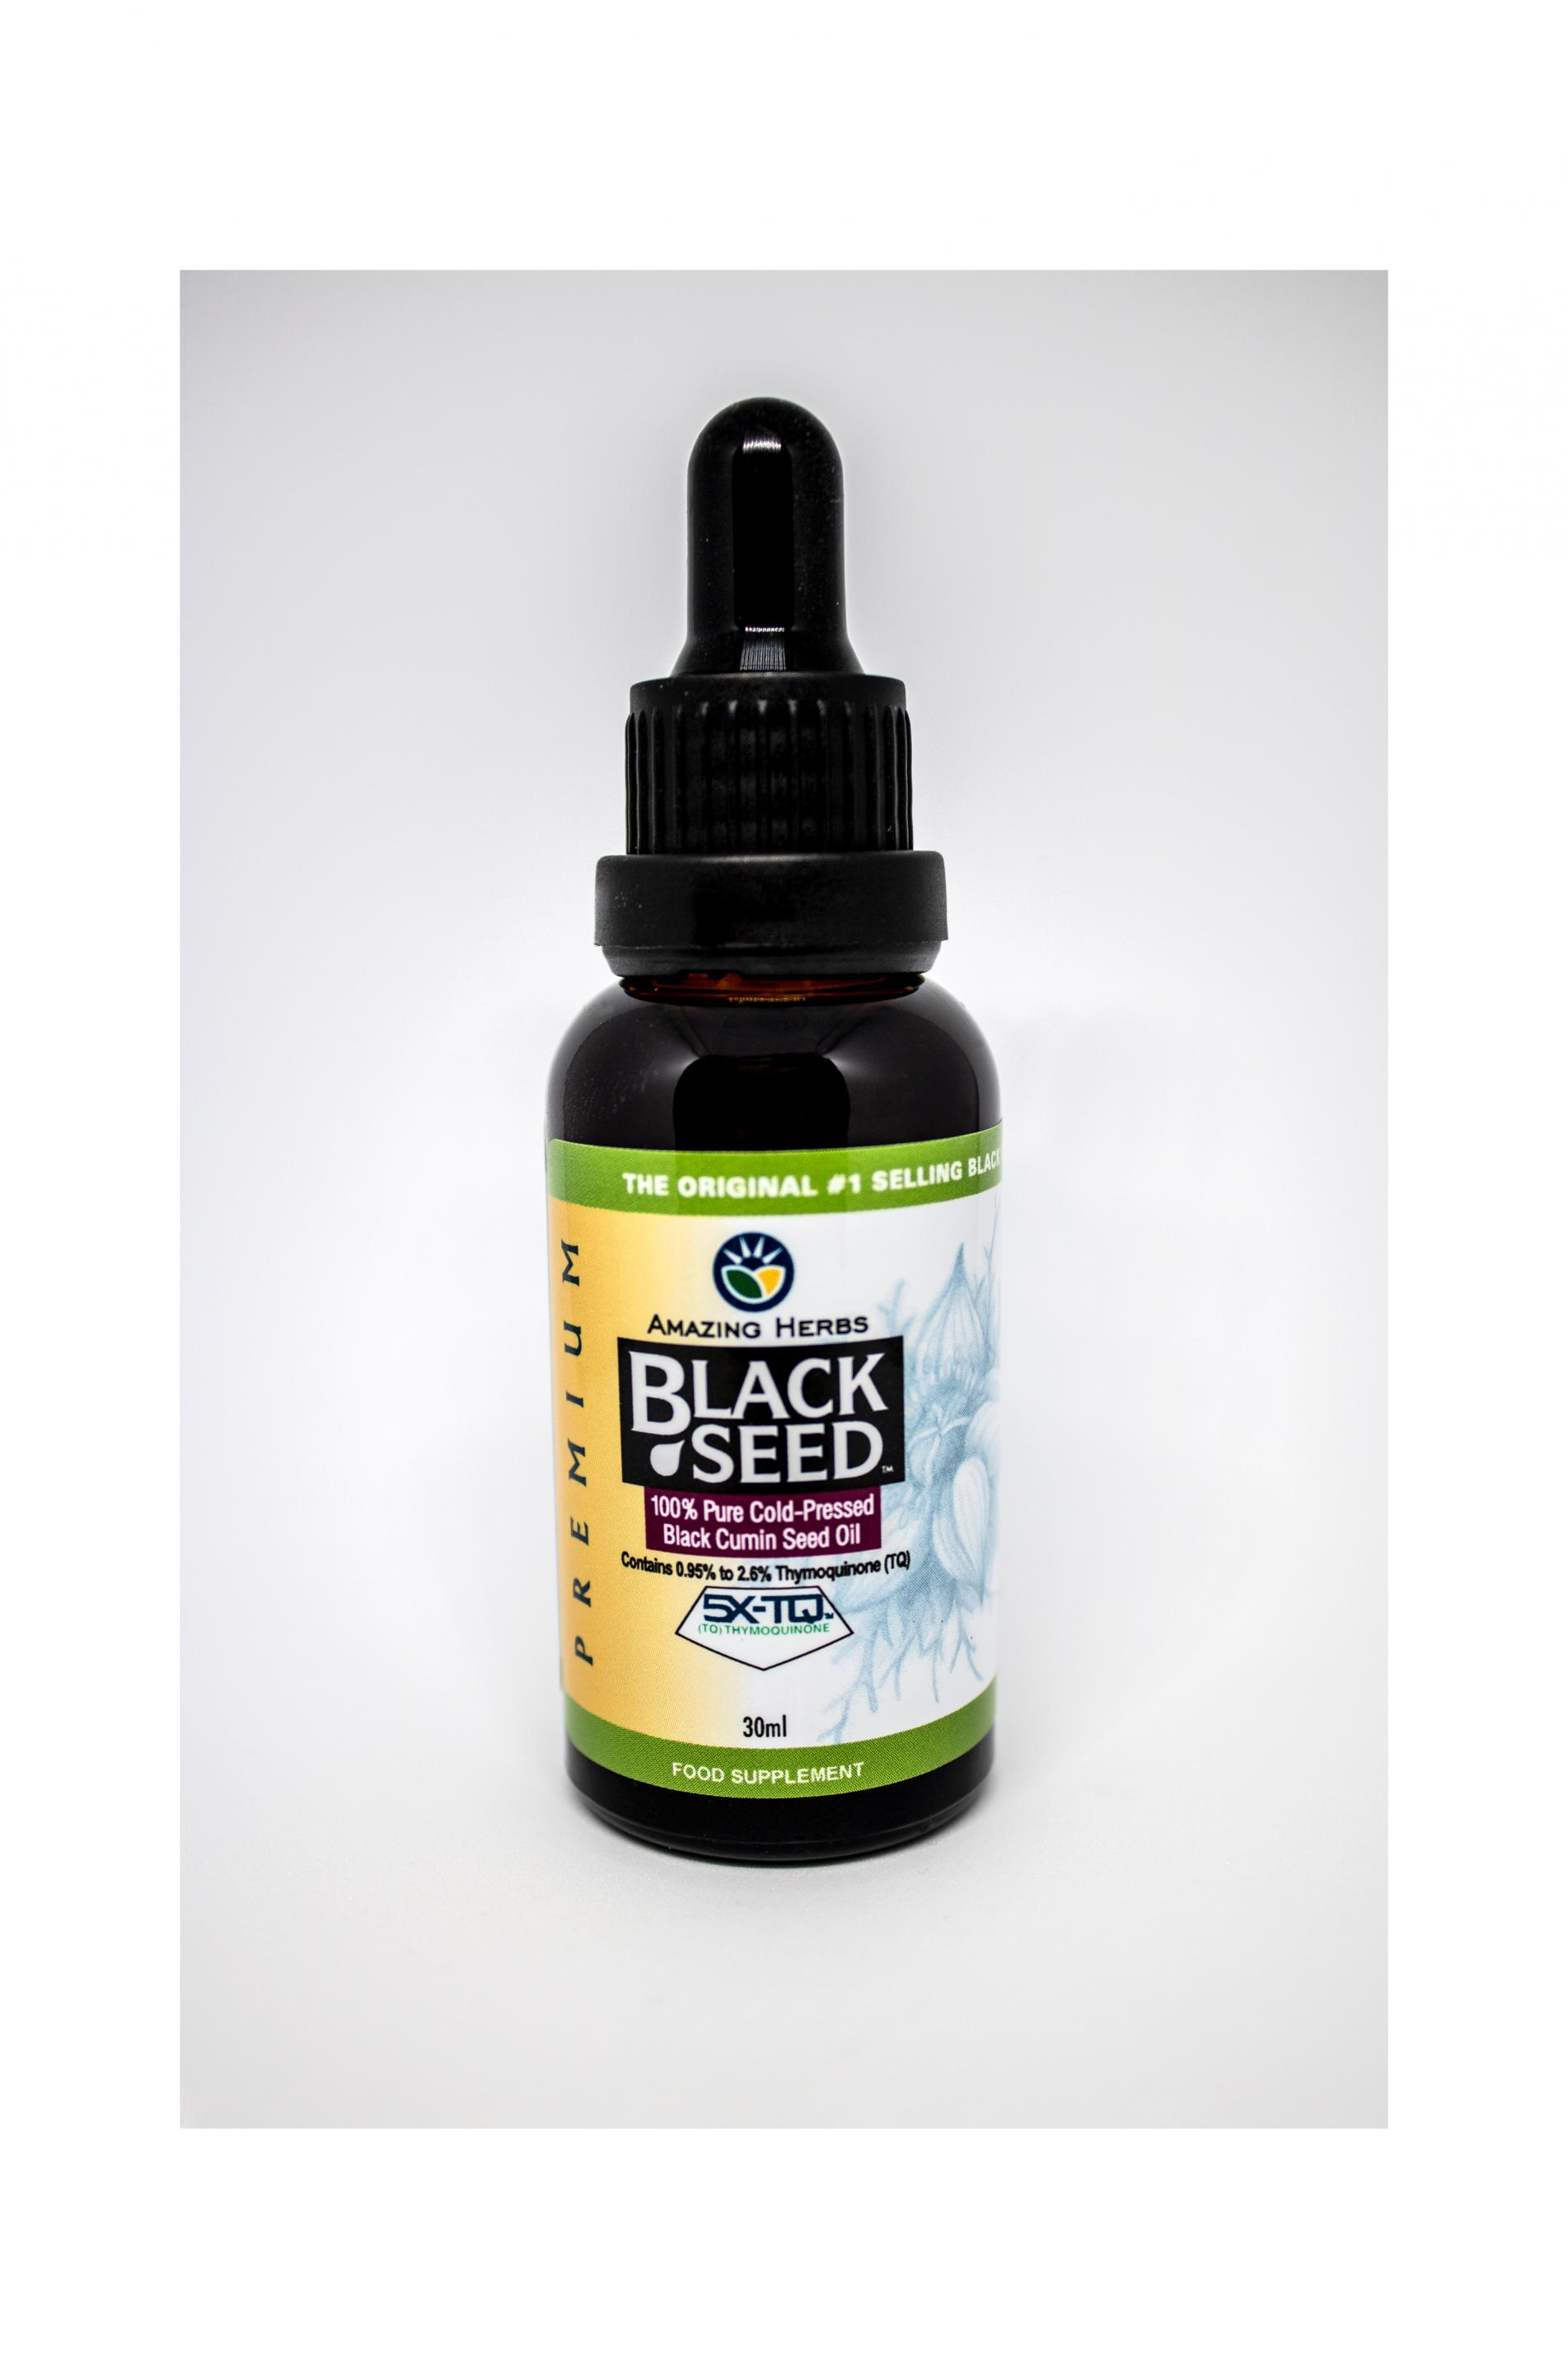 Premium Black Seed 100% Pure Cold-Pressed Black Cumin Seed Oil 30ml